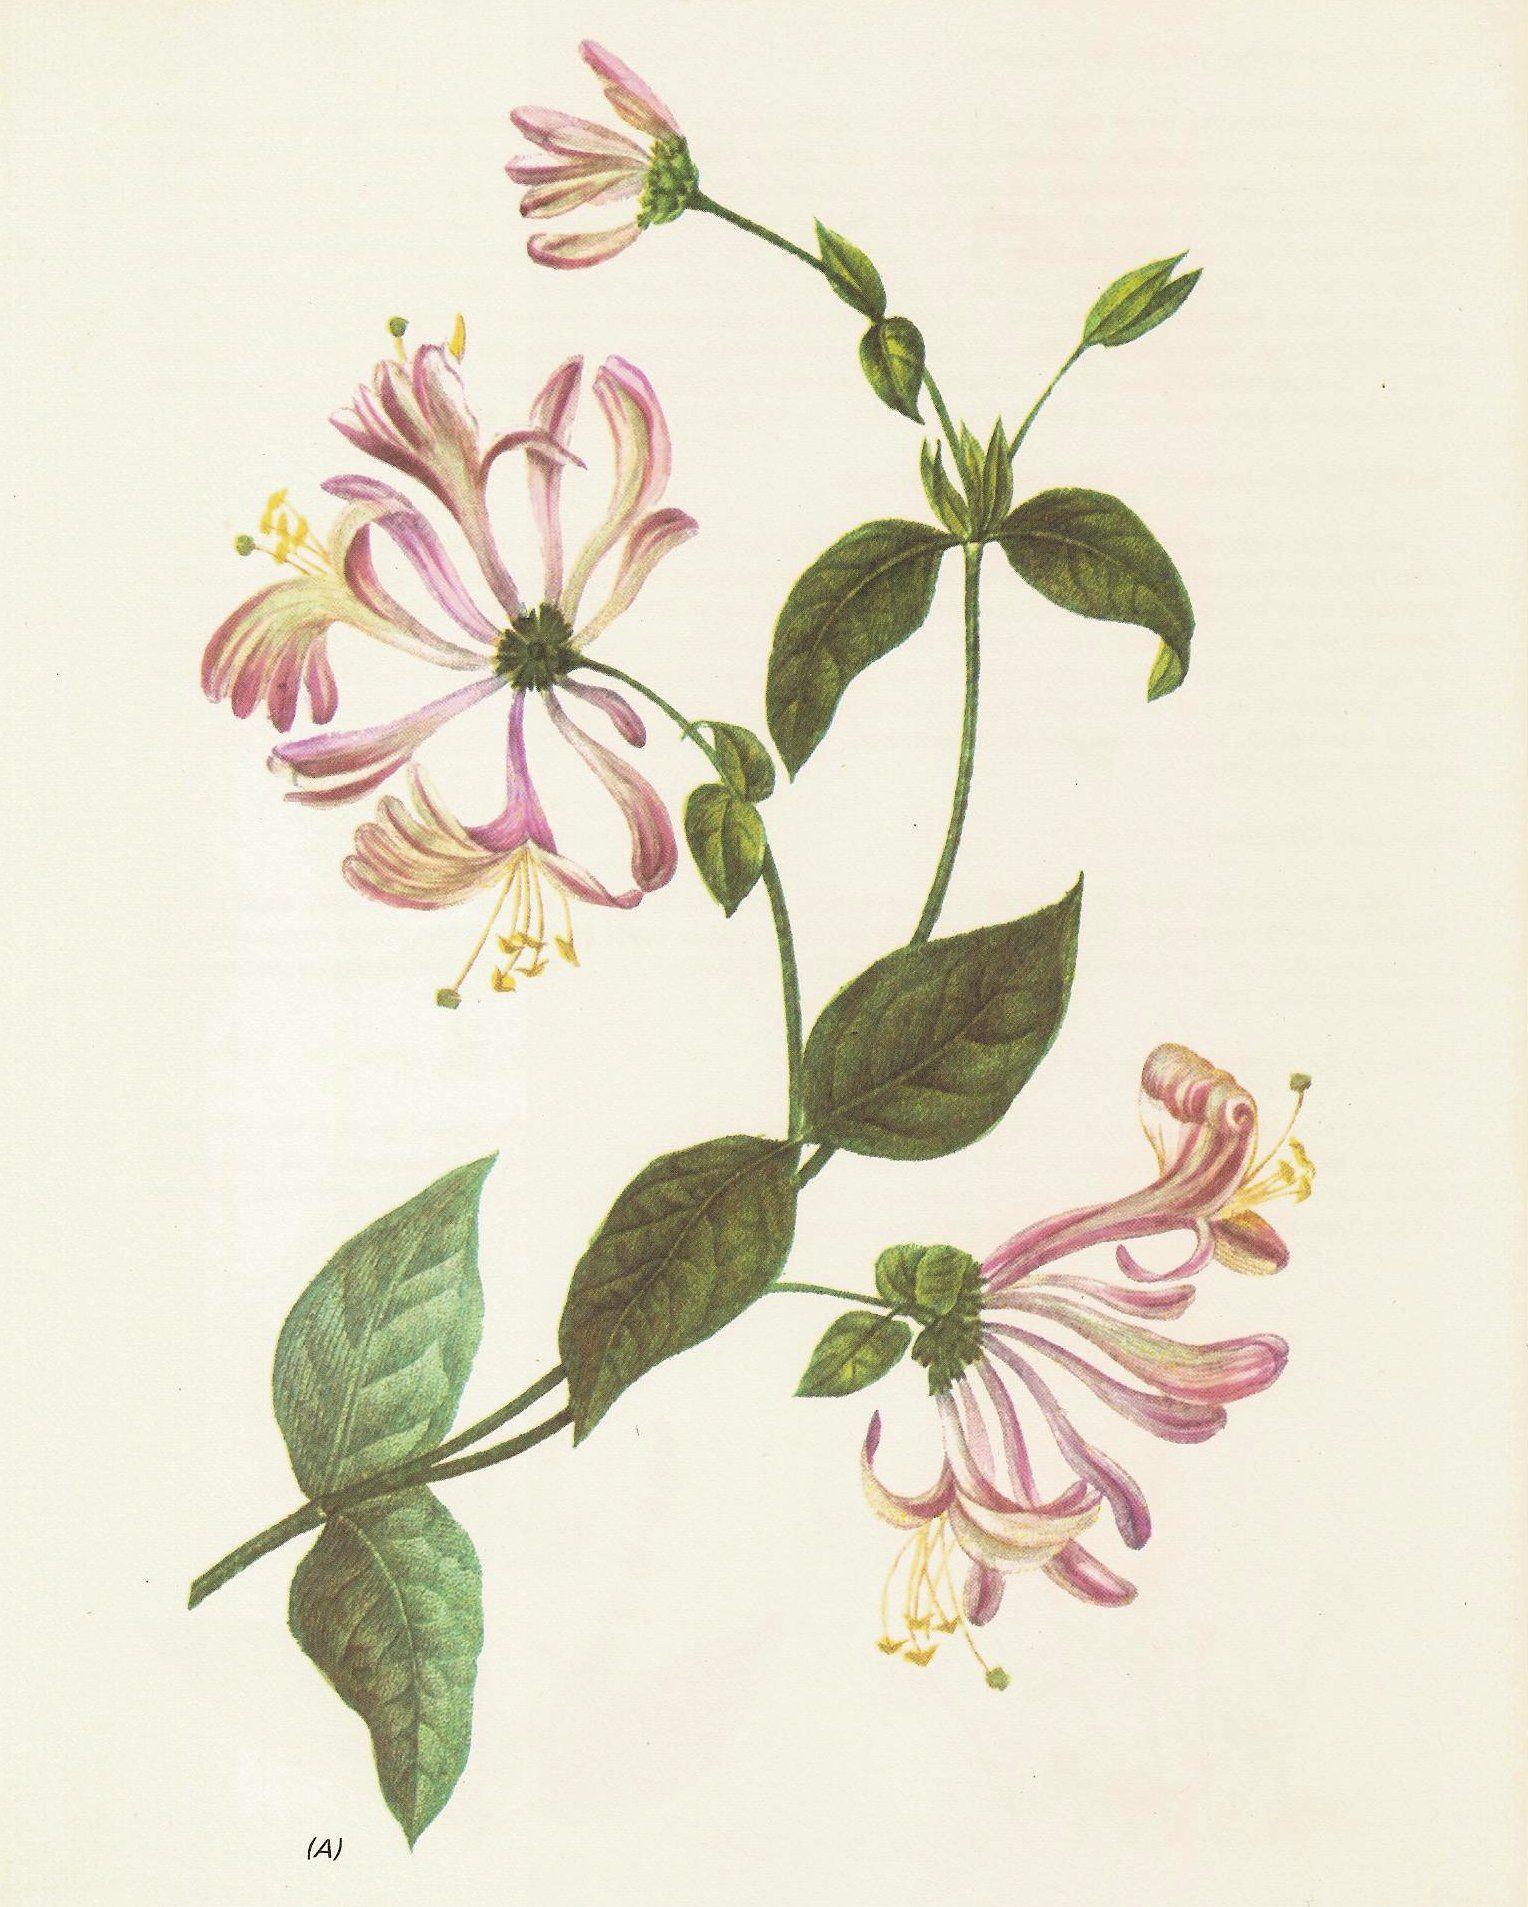 Flowers Plants Botany Vintage Retro Paintings Drawings Books Honeysuckle Tattoo Flower Drawing Botanical Drawings